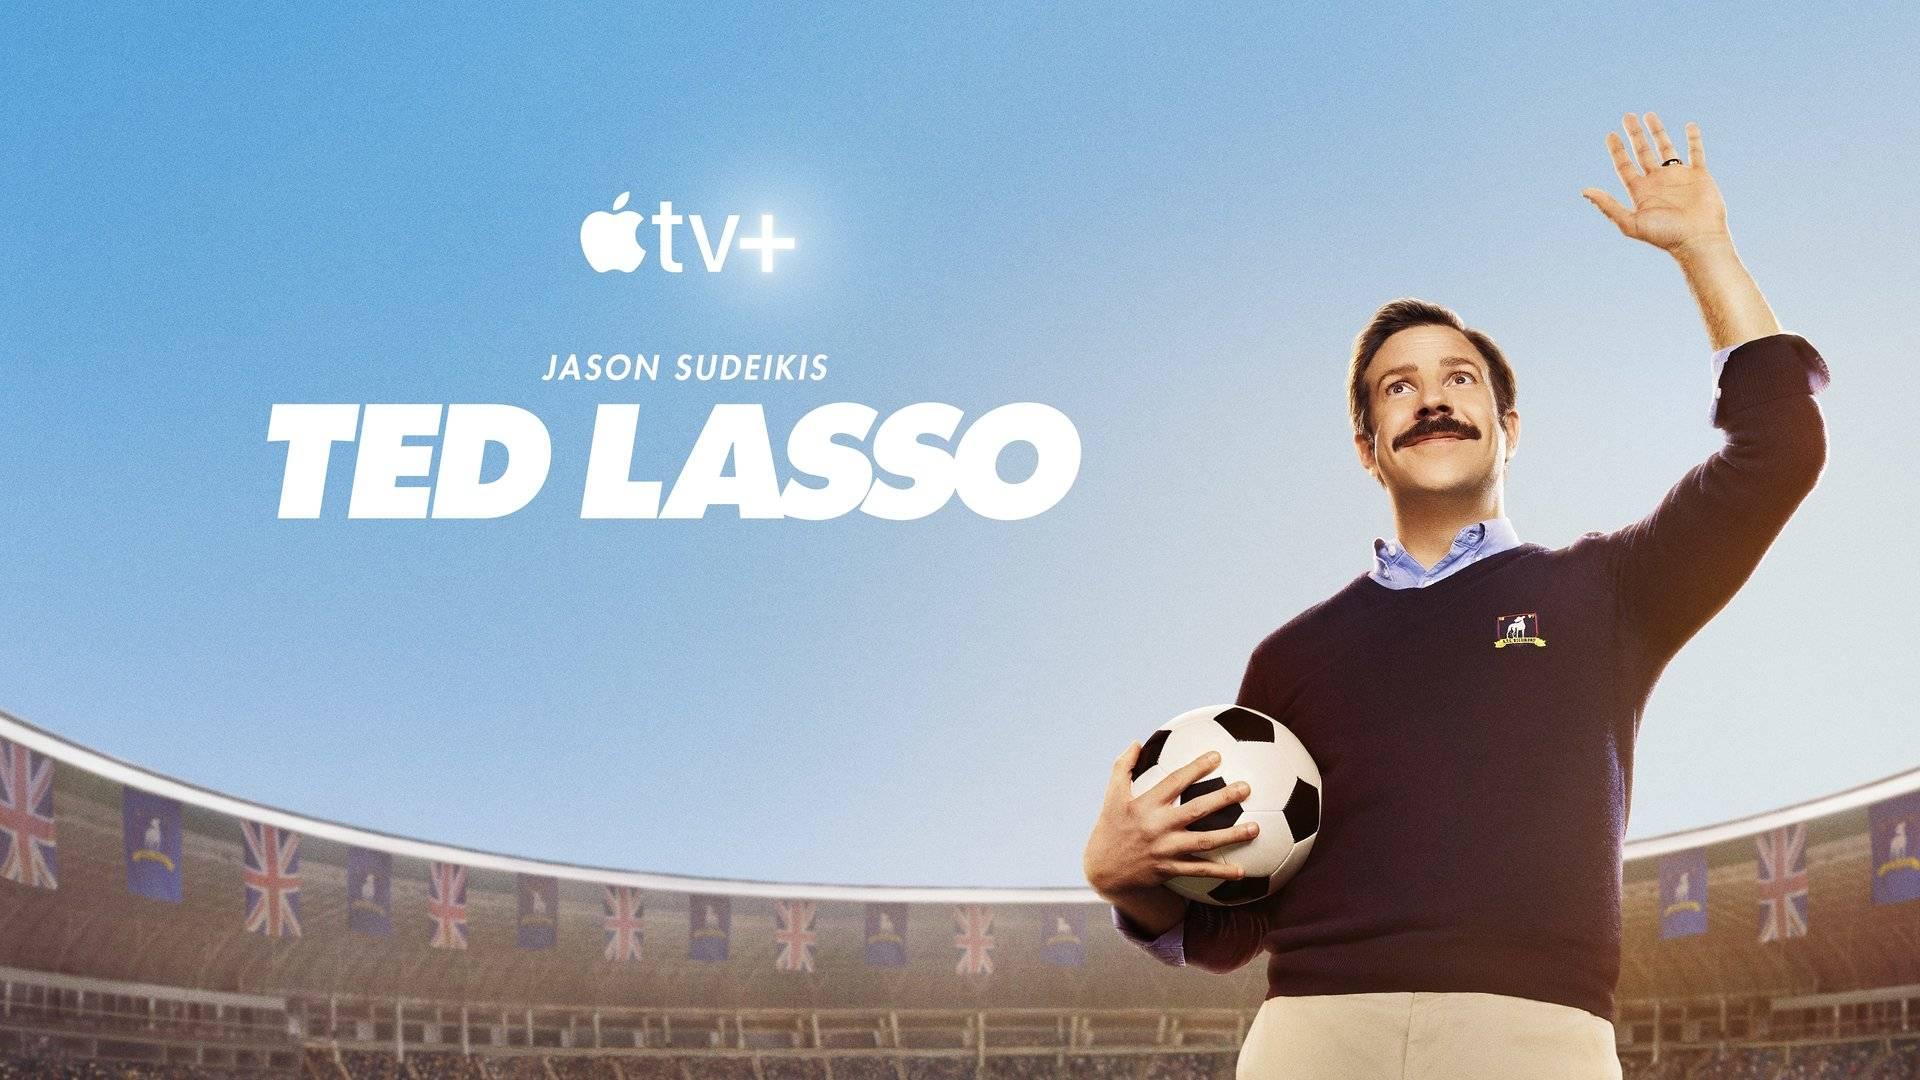 Ted Lasso・AppleTV+